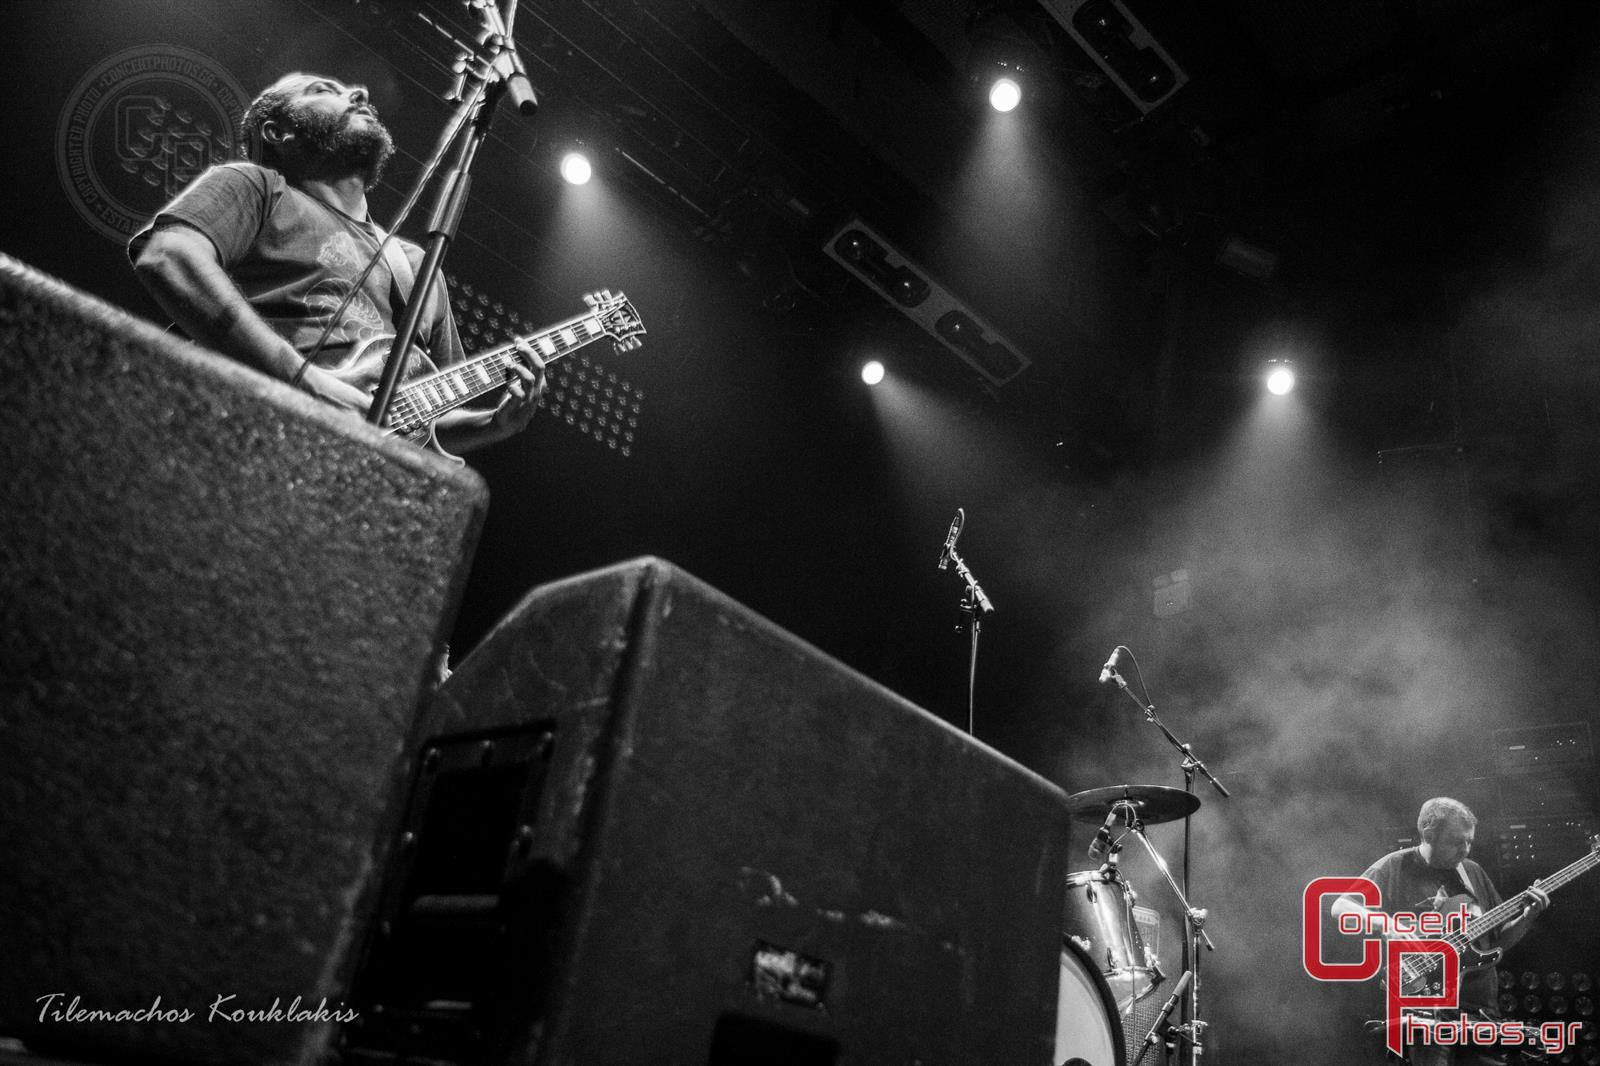 Neurosis-Neurosis photographer:  - concertphotos_20140707_23_56_48